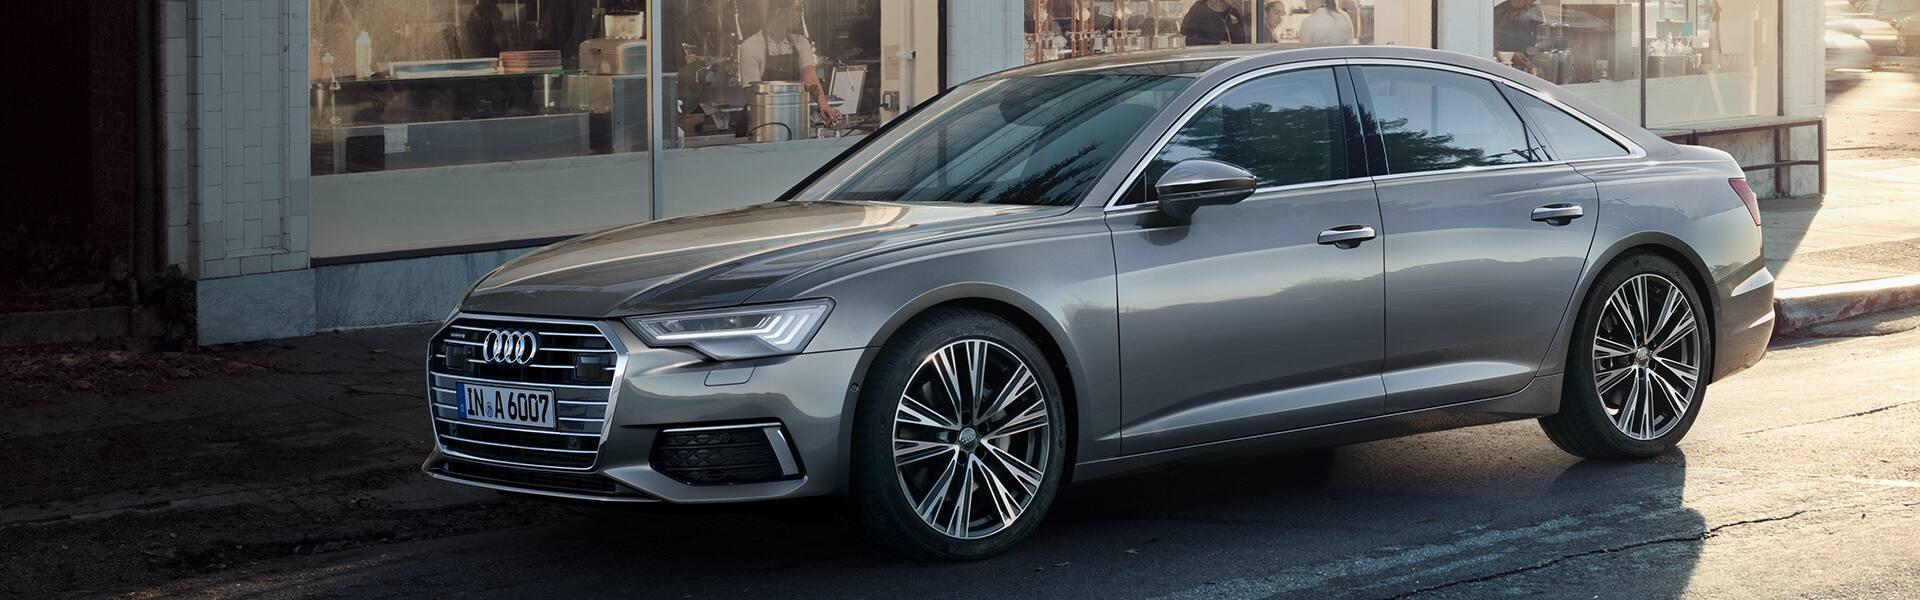 The New A6 Saloon A6 Audi Ireland